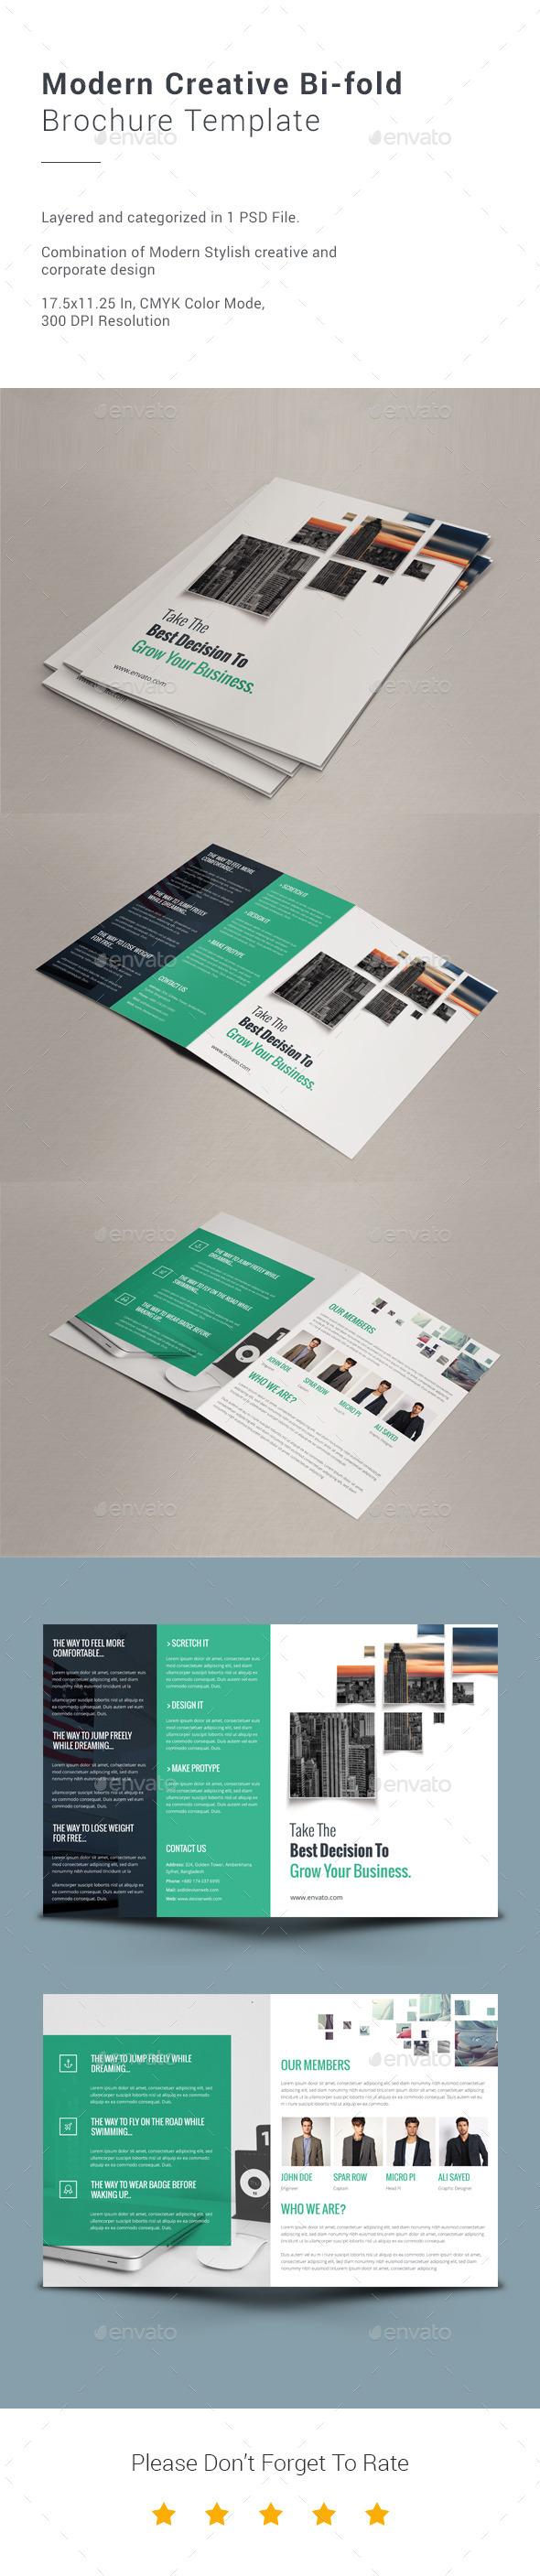 Modern Creative Bi-fold Brochure Template - Informational Brochures